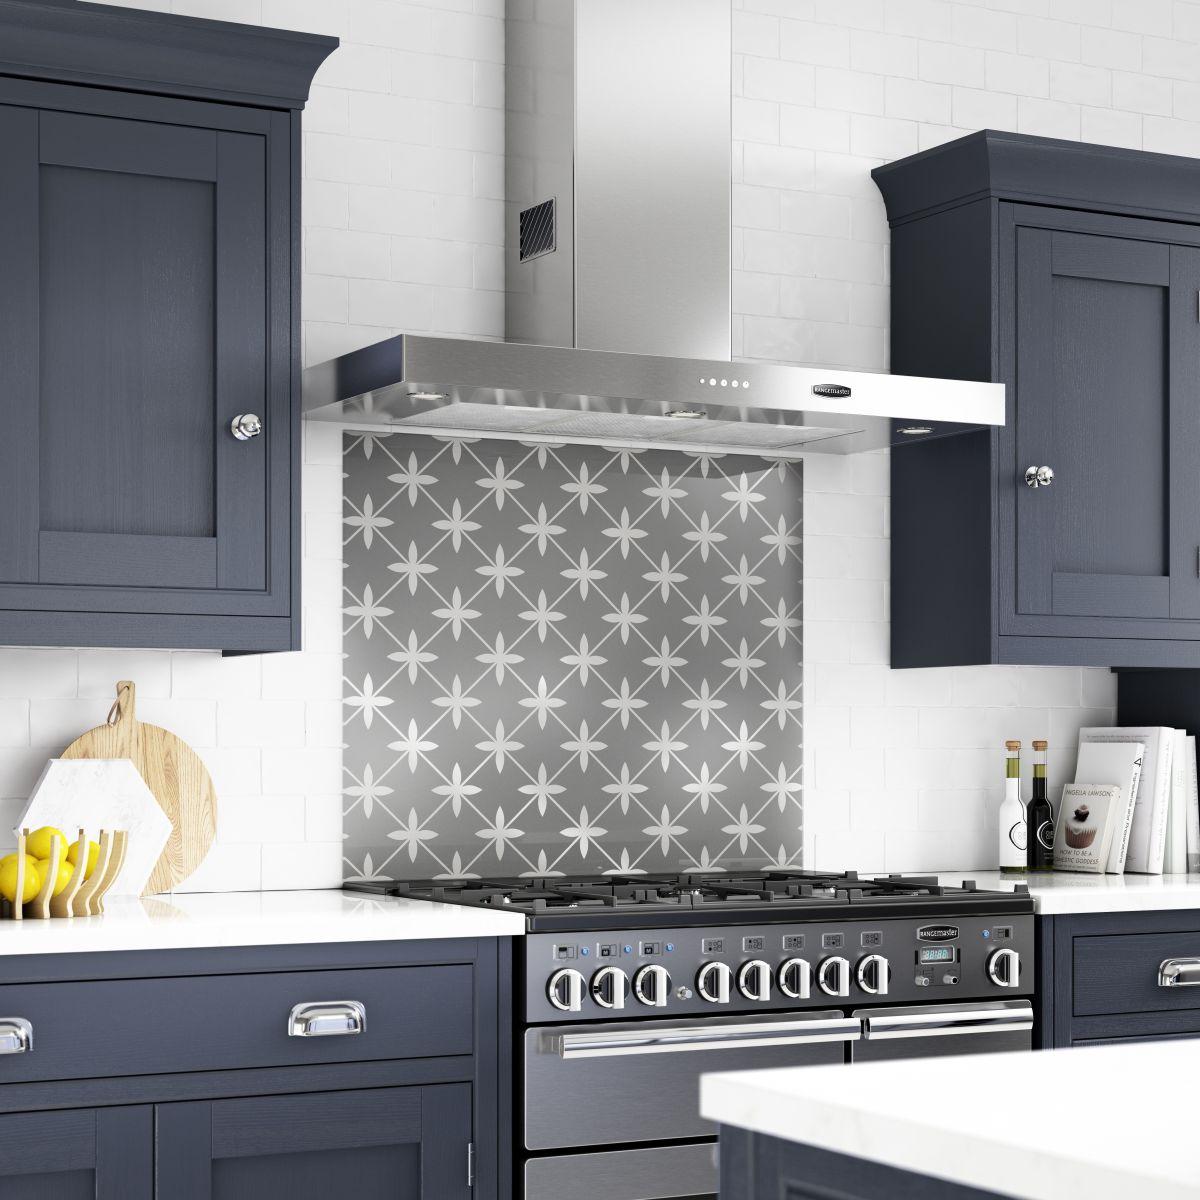 Kitchen splashback ideas: 12 looks to copy for a quick kitchen